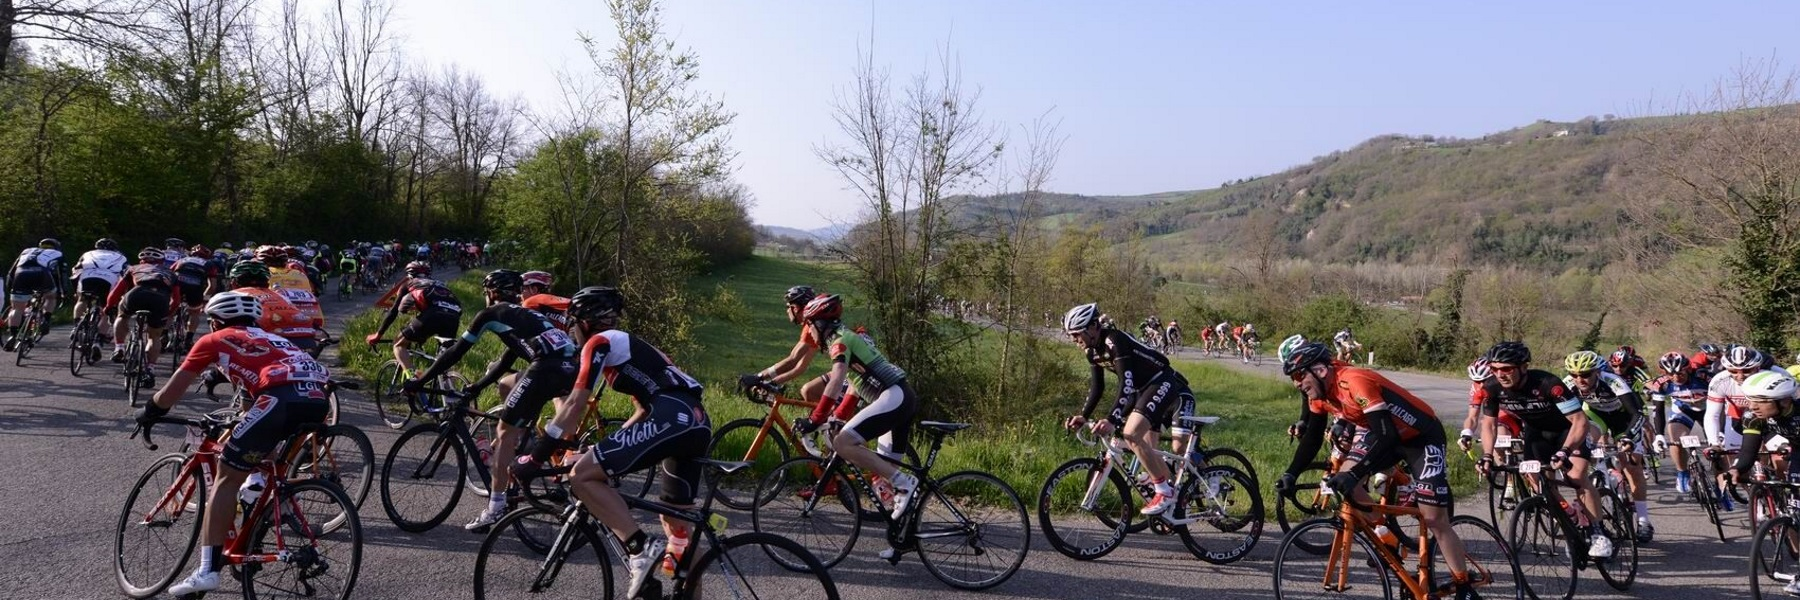 Granfondo Die Salzstrasse - Cervia Cycling Festival